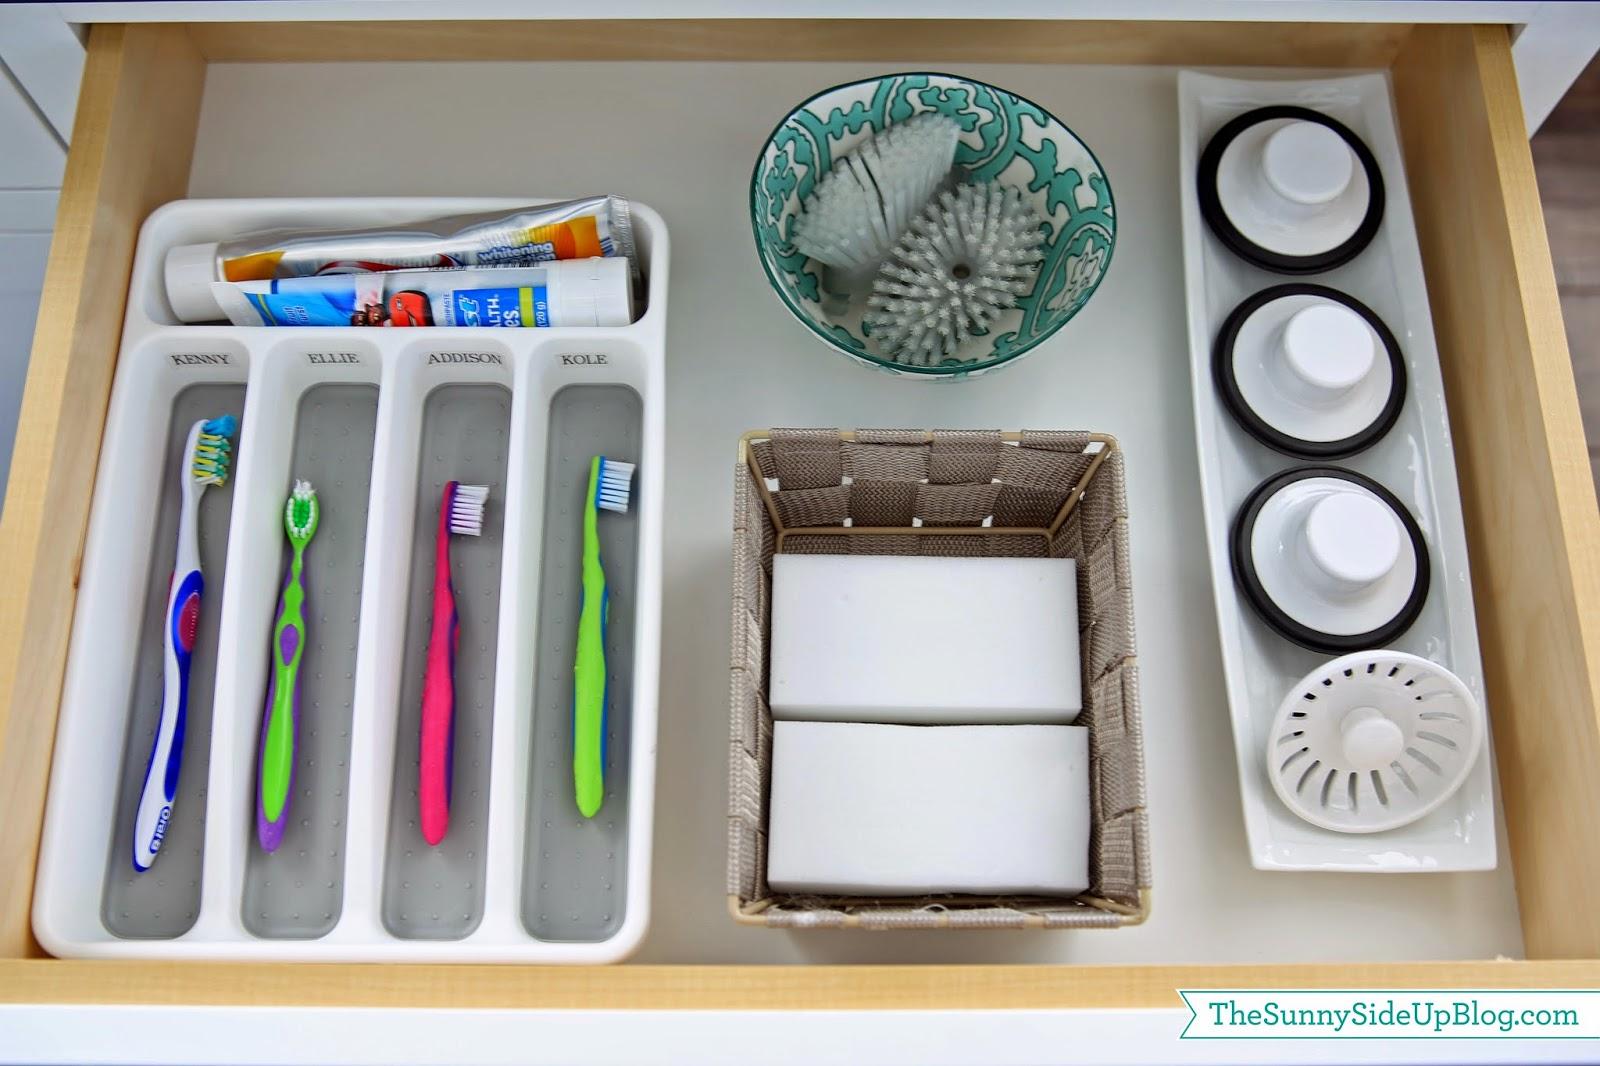 Organized kitchen sink drawer the sunny side up blog - Keep toothpaste kitchen ...